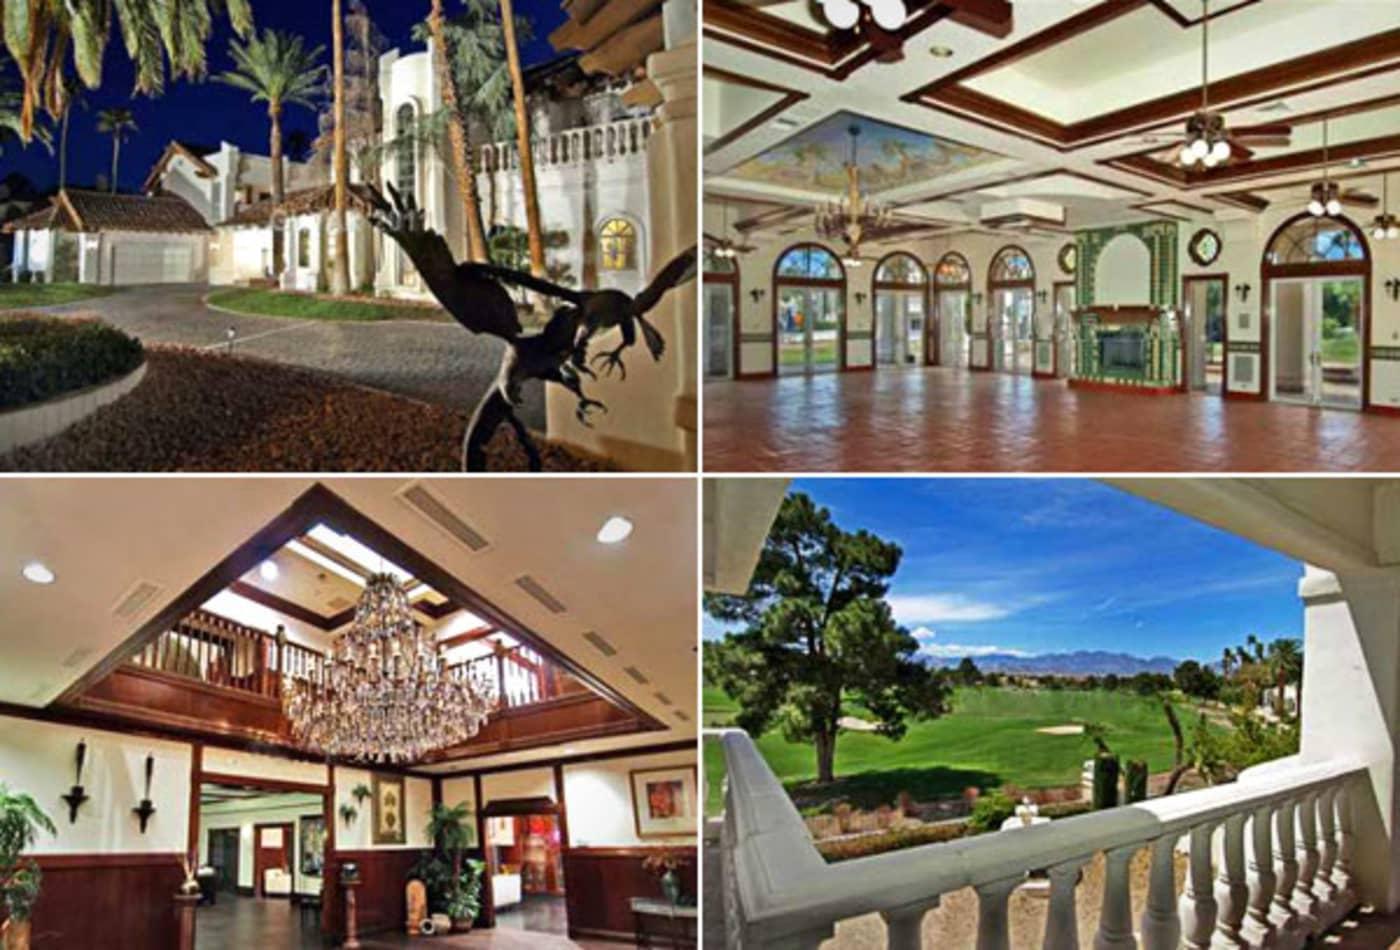 Grand-Scale-Las-Vegas-Nevada-Golf-Homes-CNBC.jpg